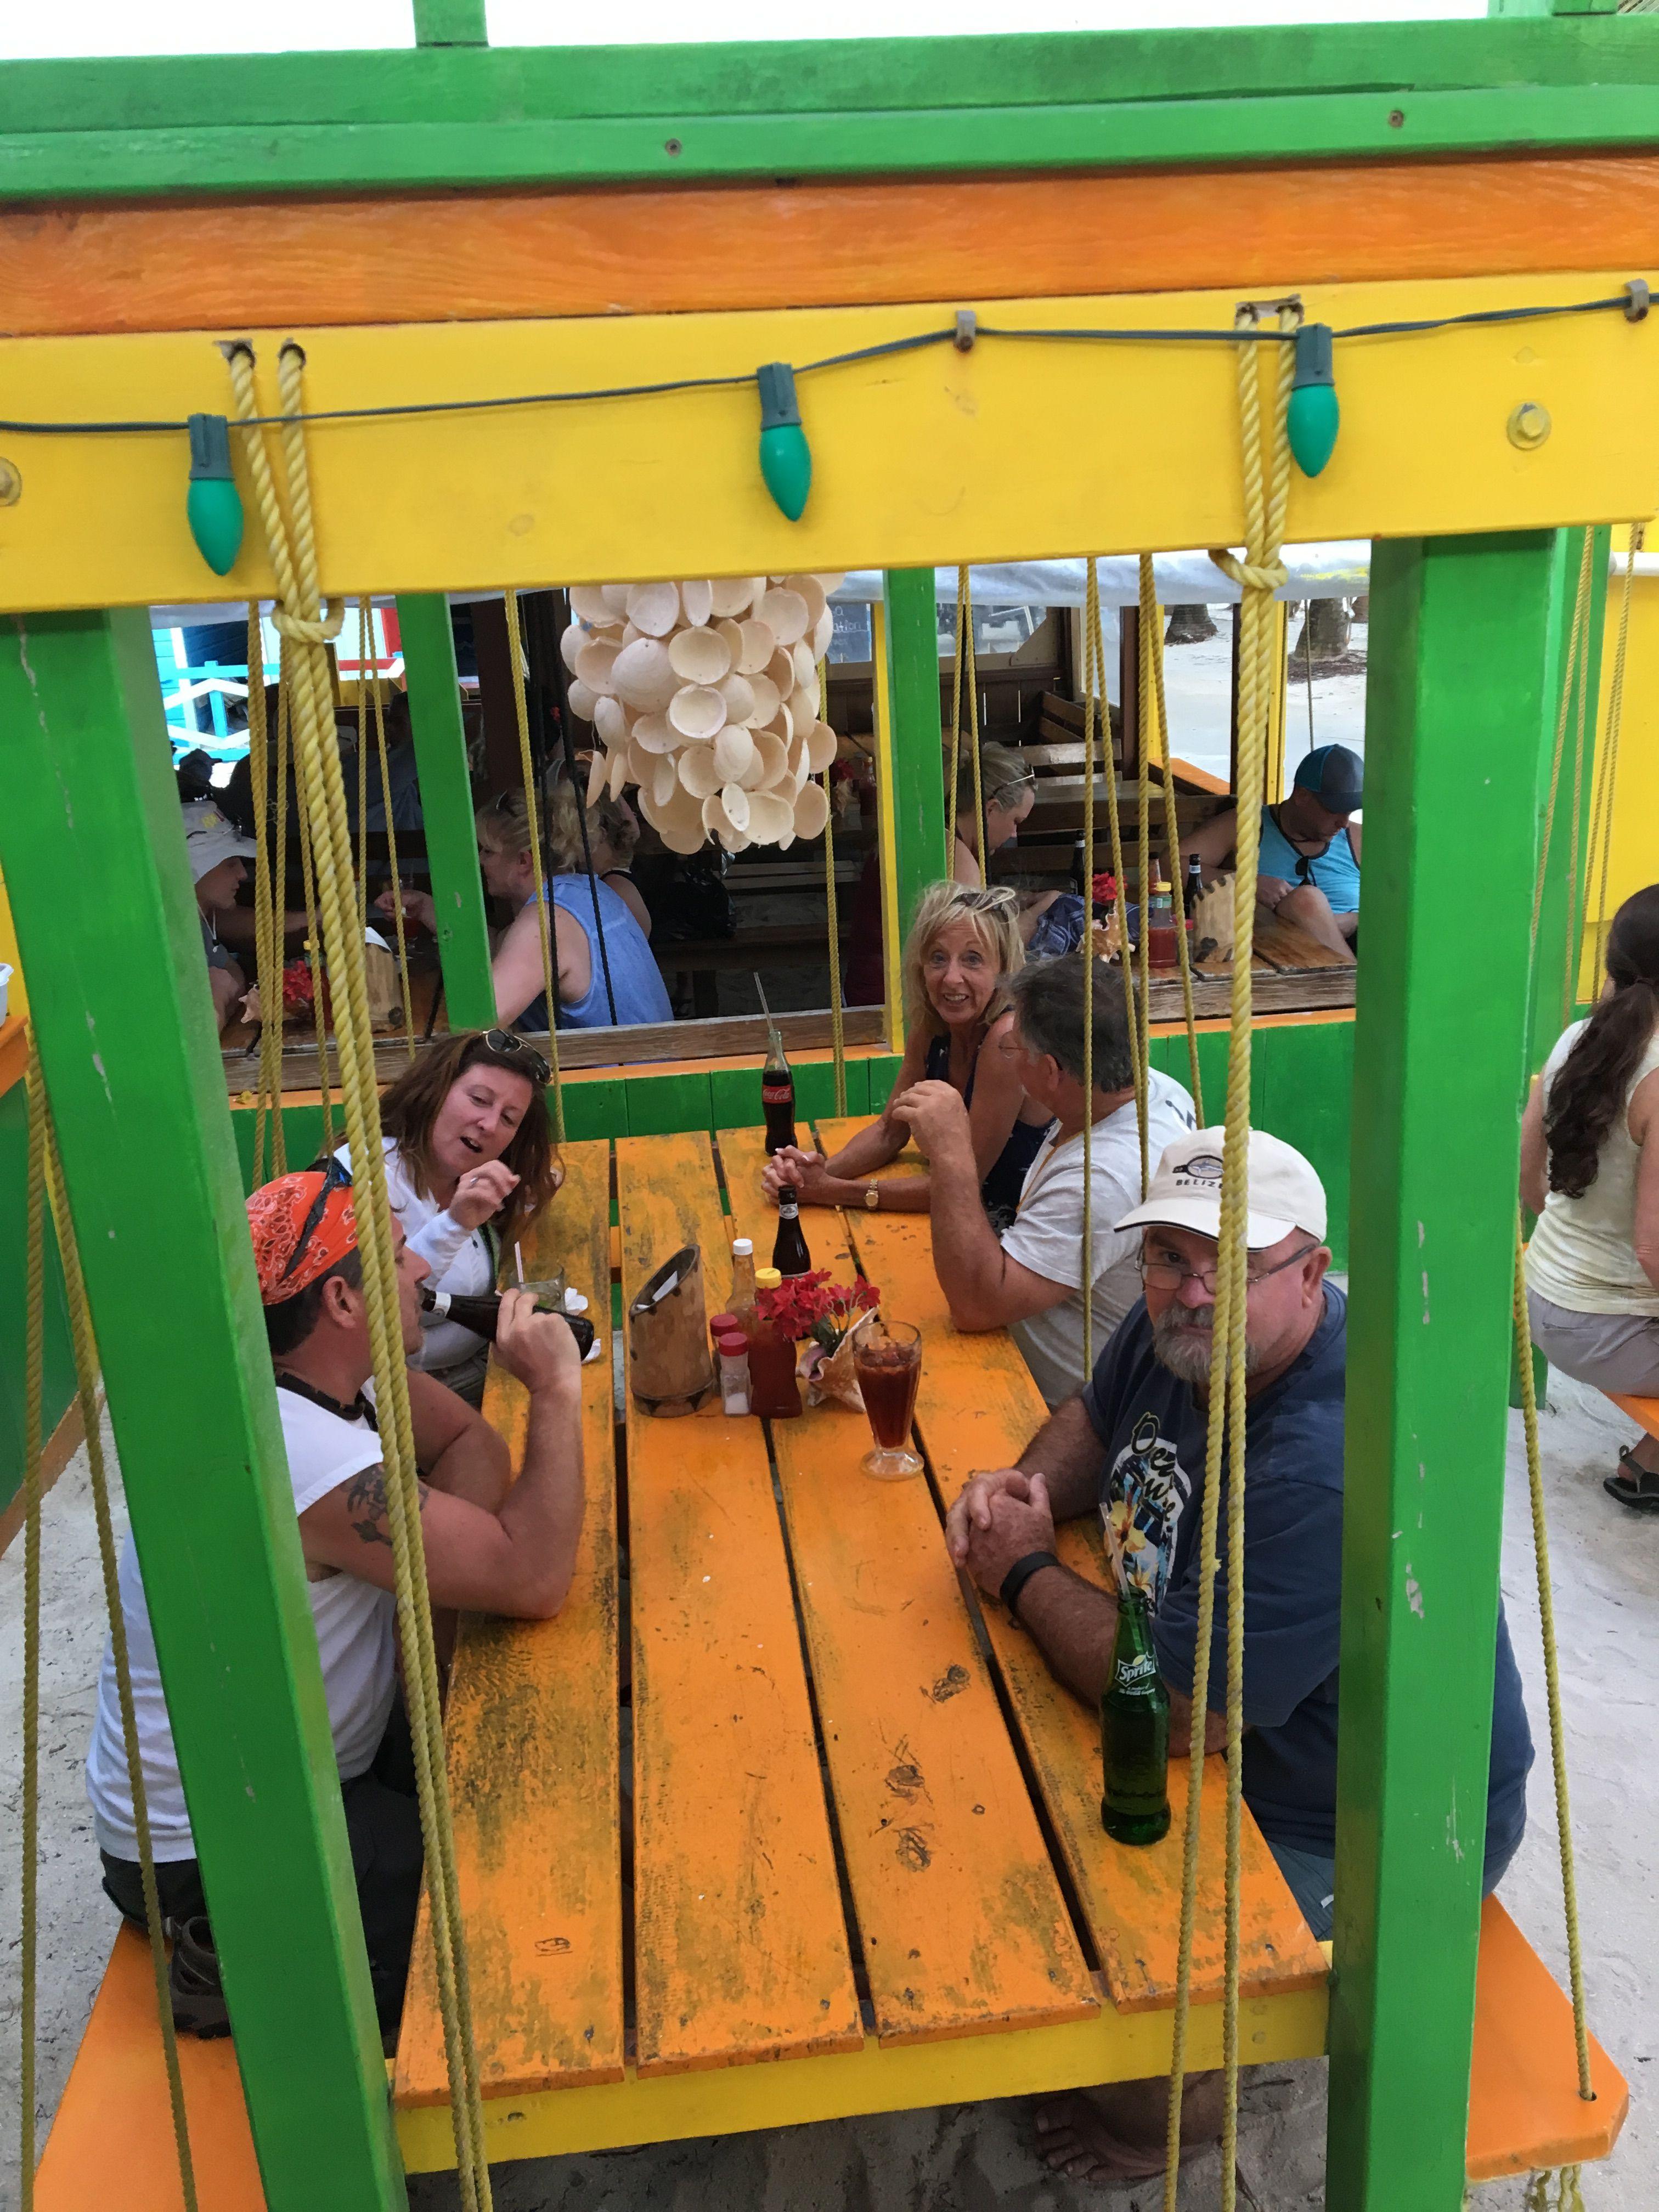 Bambooze restaurant island life caye caulker belize